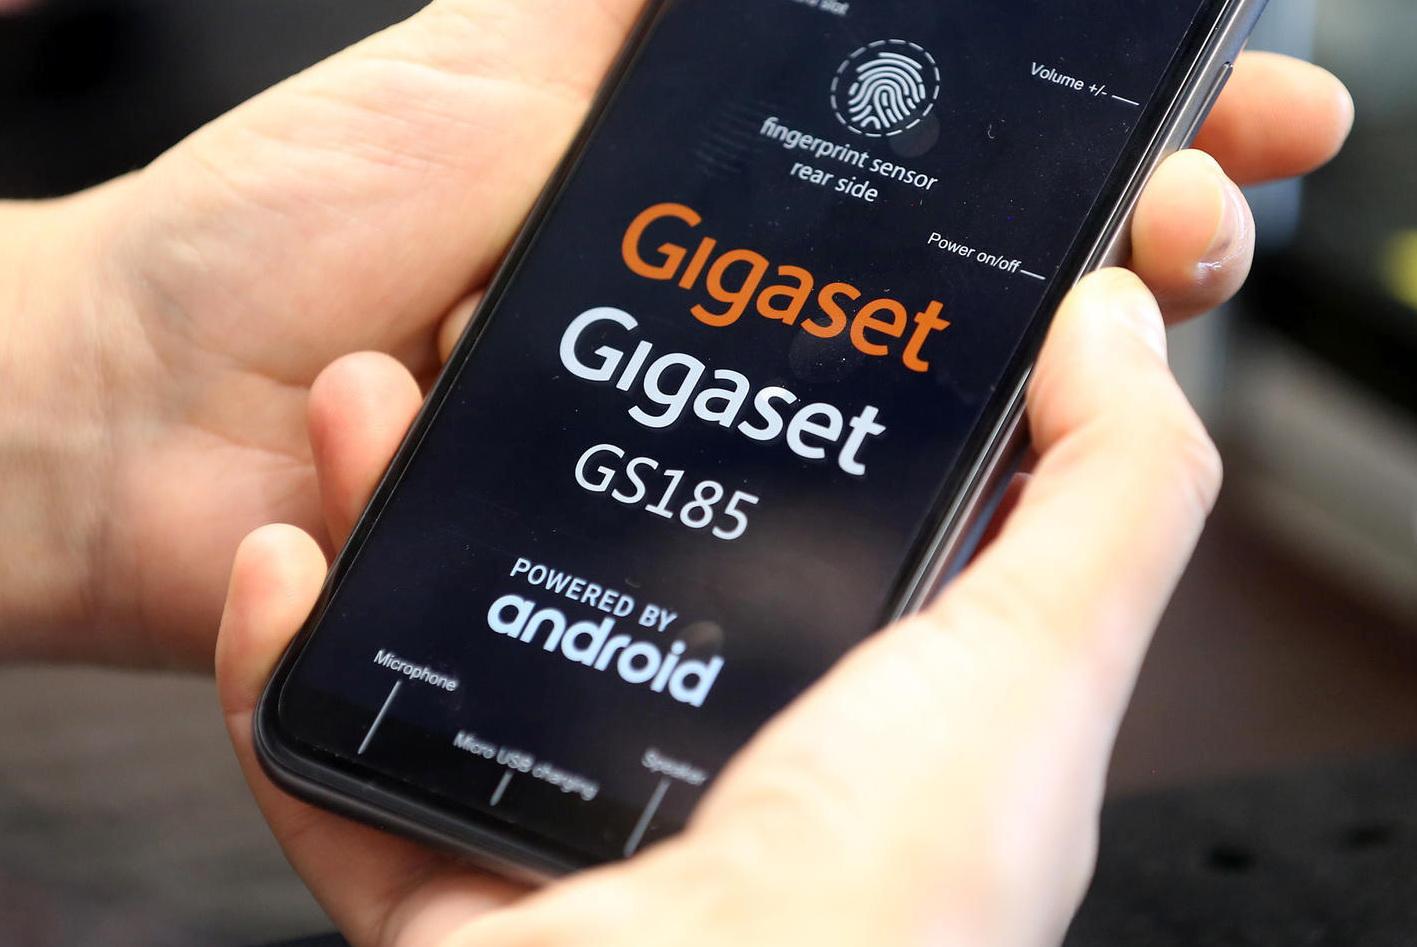 Gigaset smartphones infected with malware